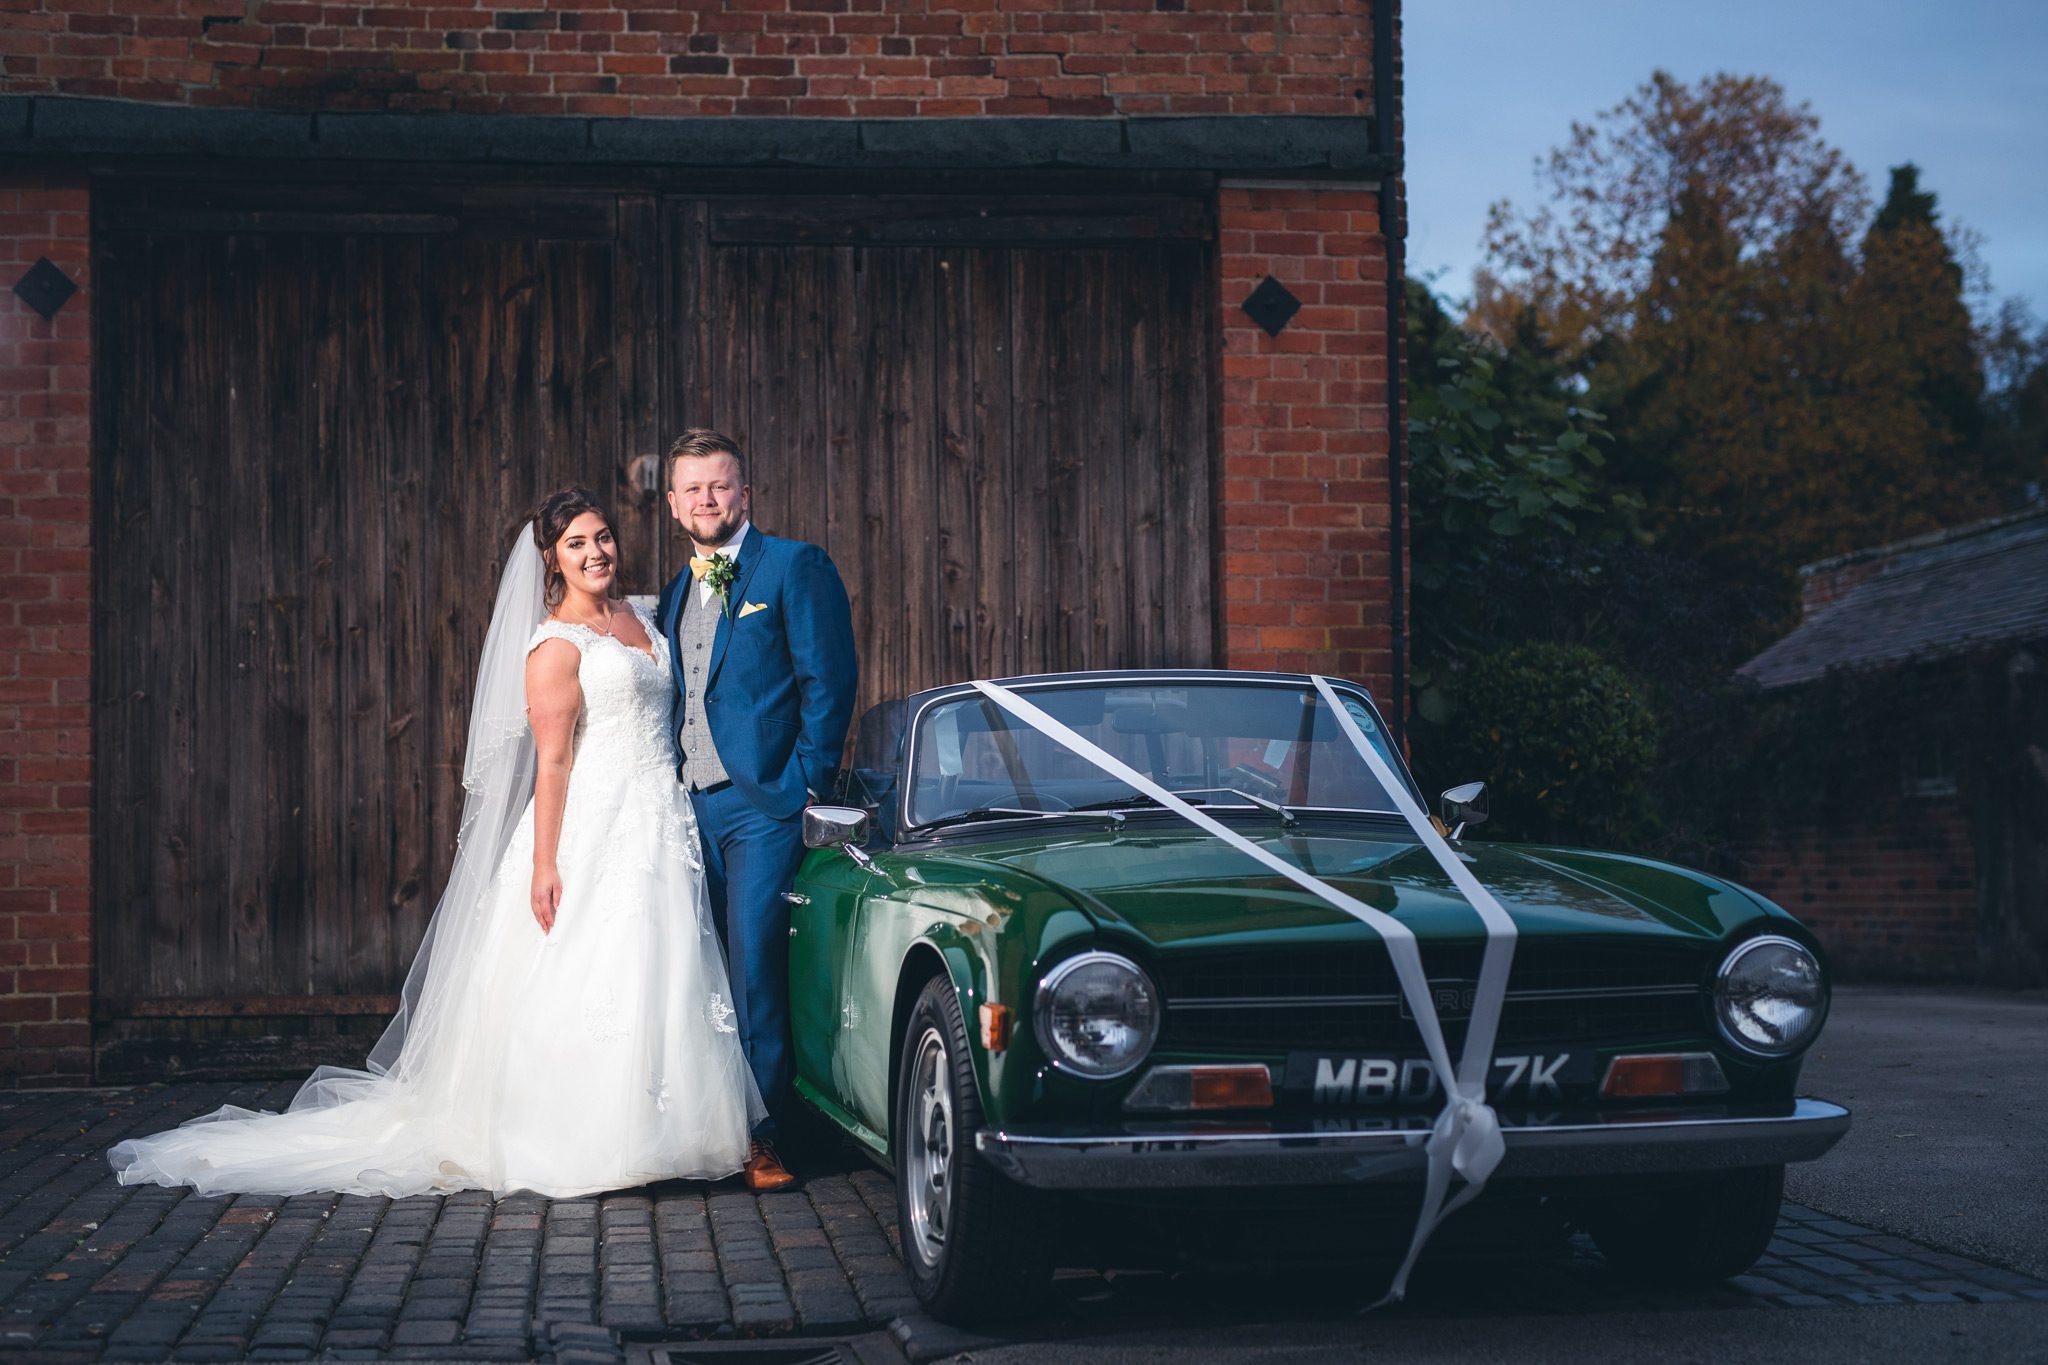 Couple with vintage car outside Yeldersley Hall